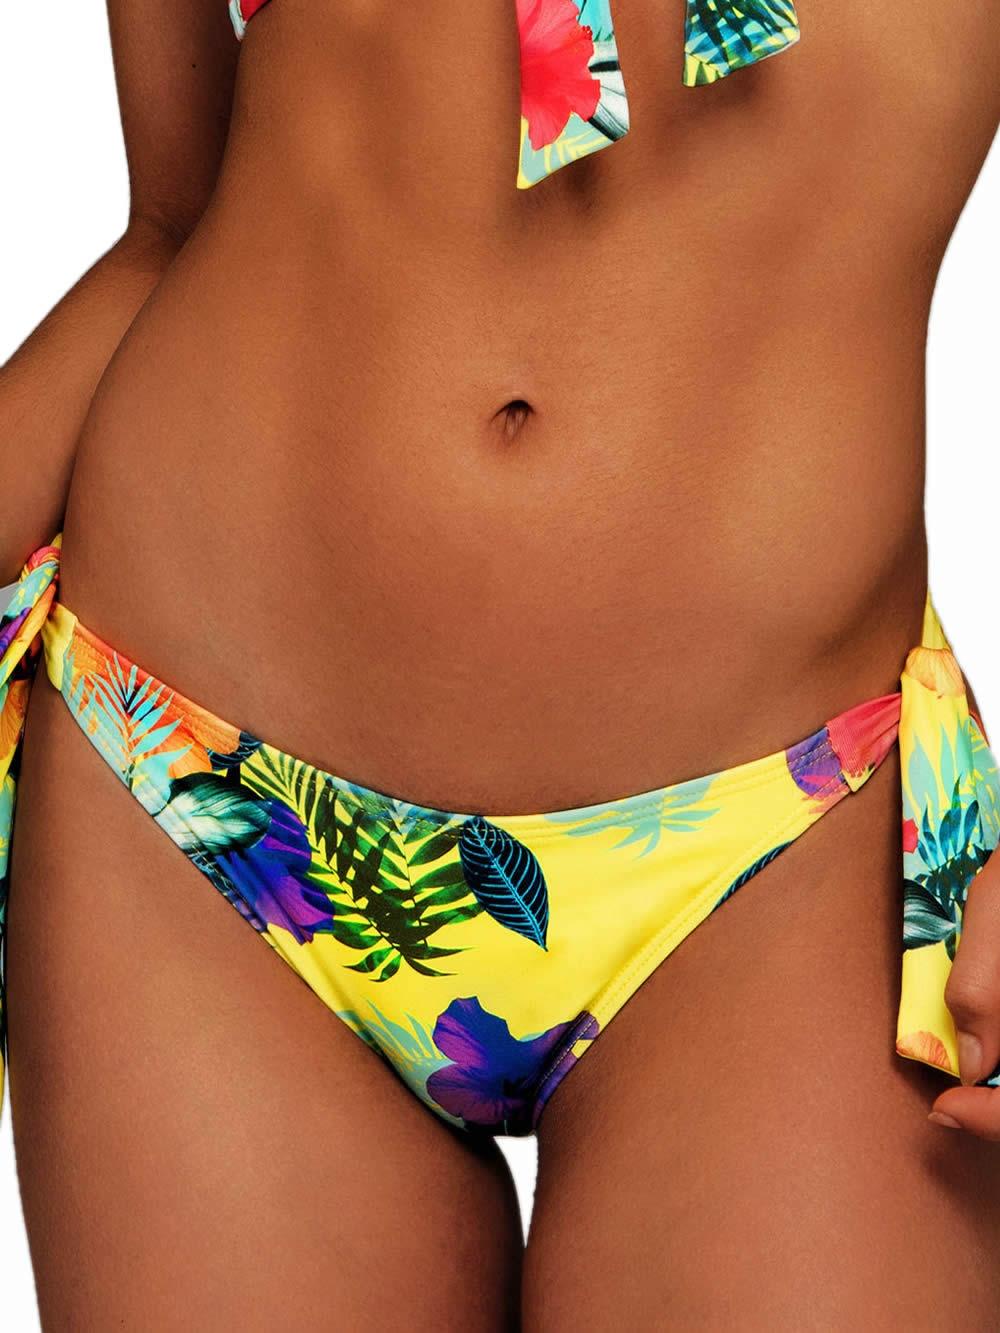 a7d60d0ef46 Μαγιό BLU4U Yellow Hibiscus - Bikini Κανονικό Κοφτό - Δένει στο Πλάι -  Καλοκαίρι 2019